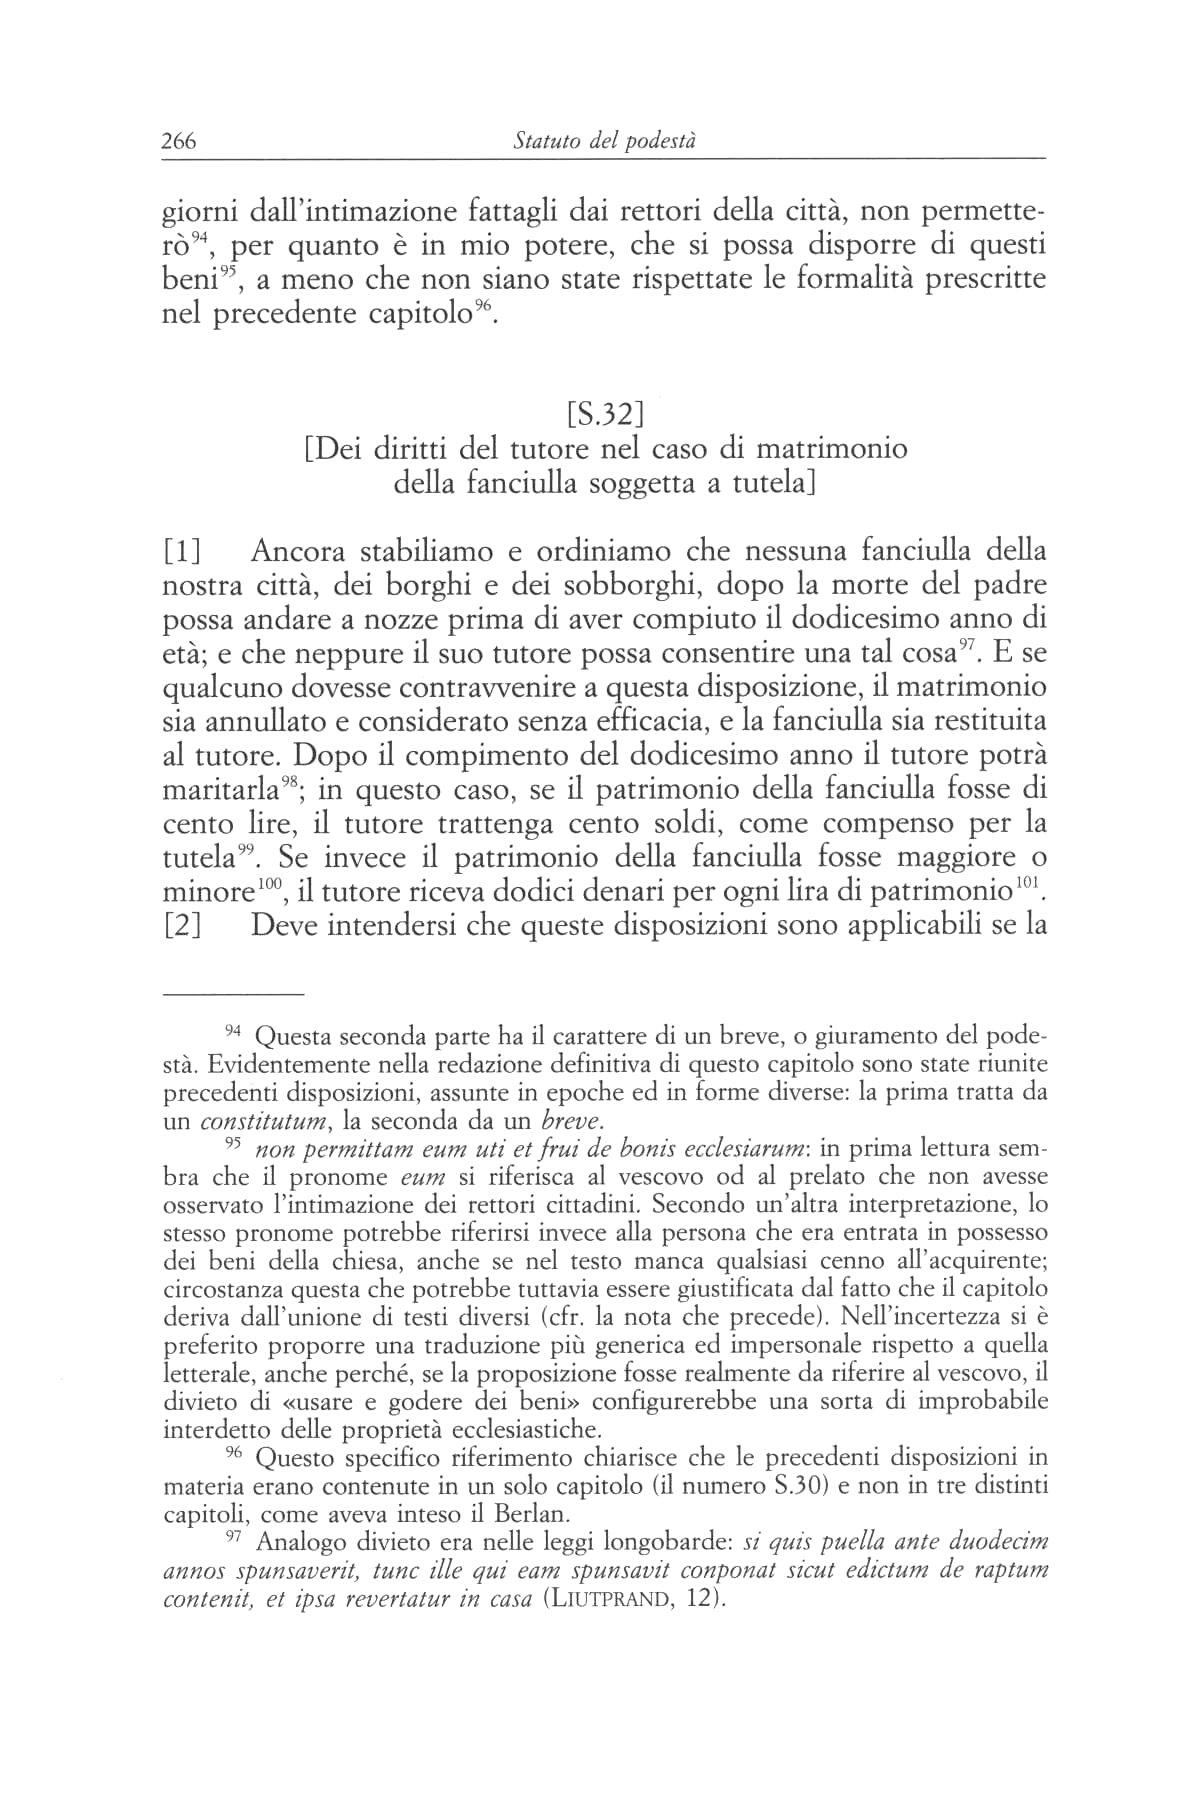 statuti pistoiesi del sec.XII 0266.jpg